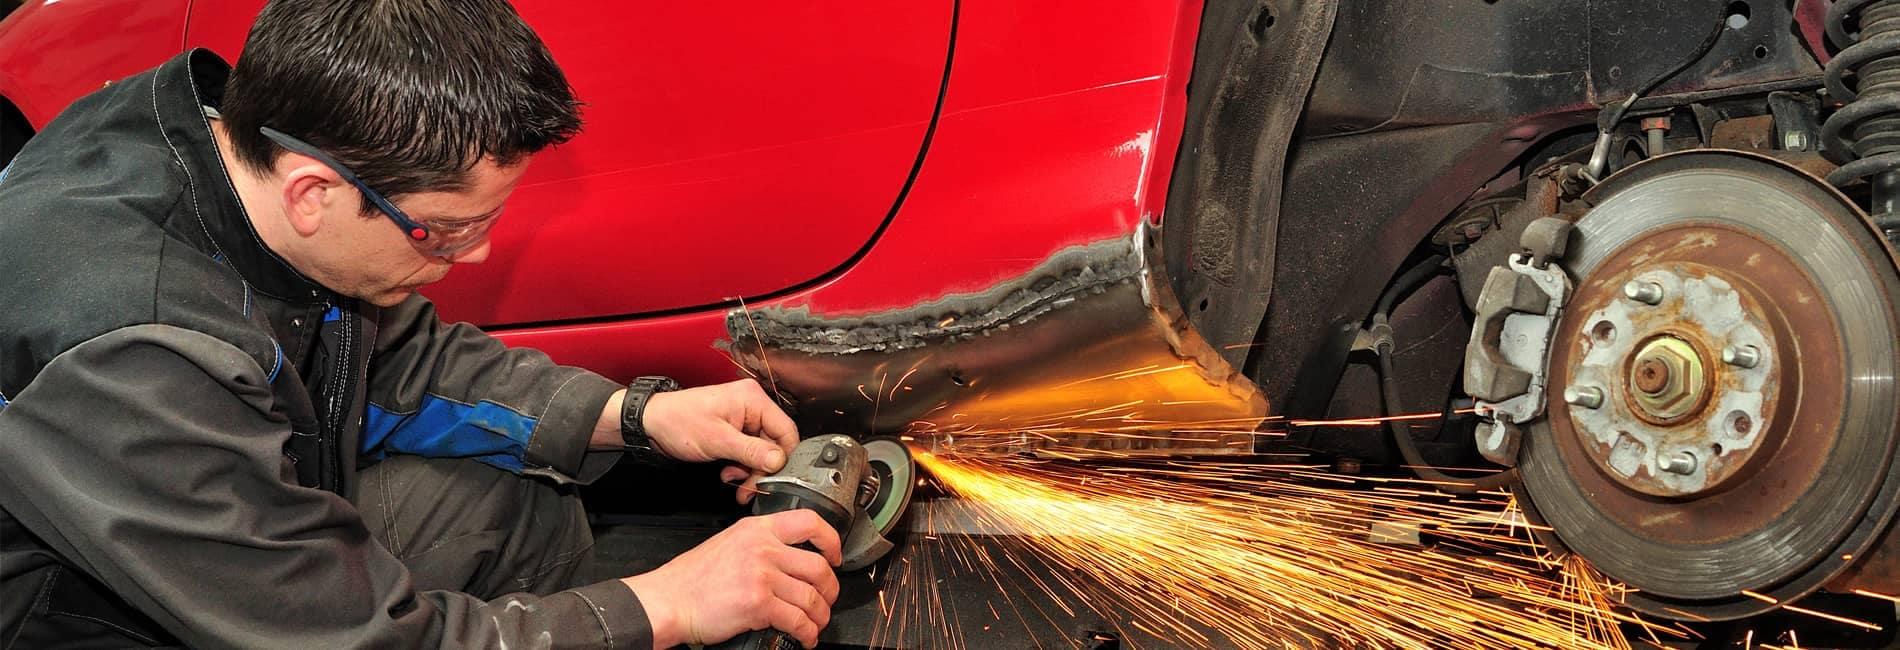 Body-Shop-technician-working-on-a-car